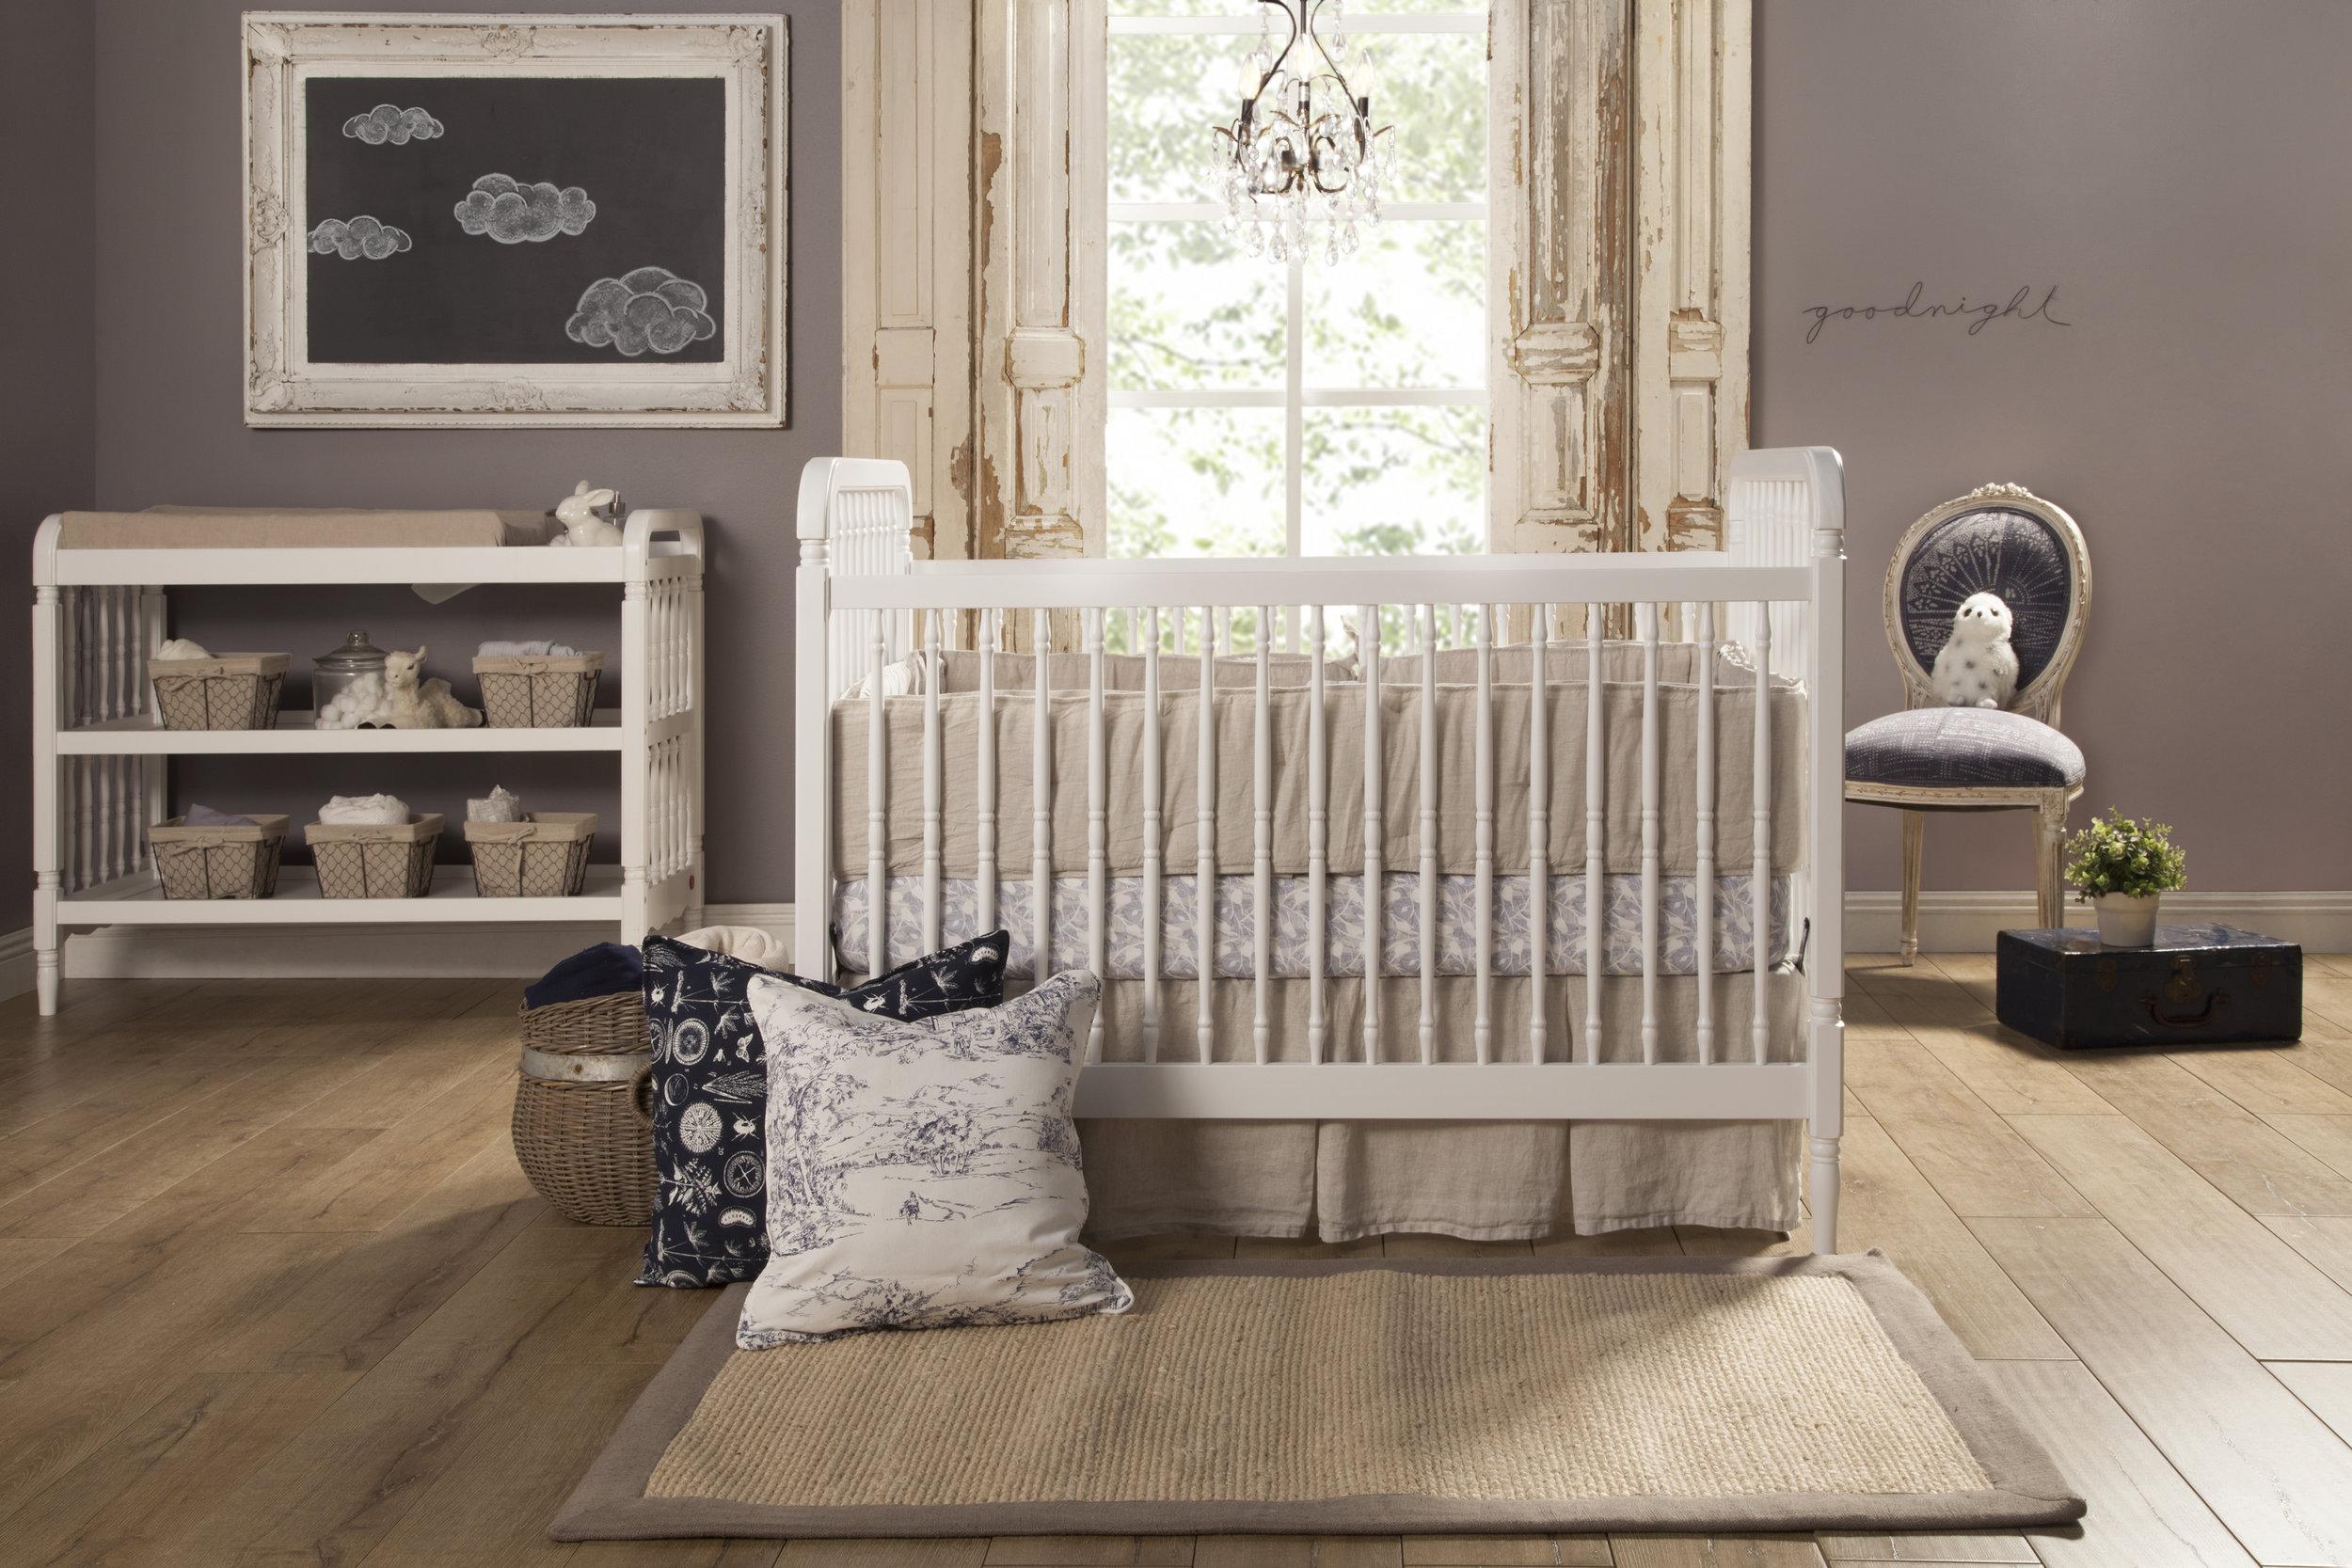 Liberty Crib $299